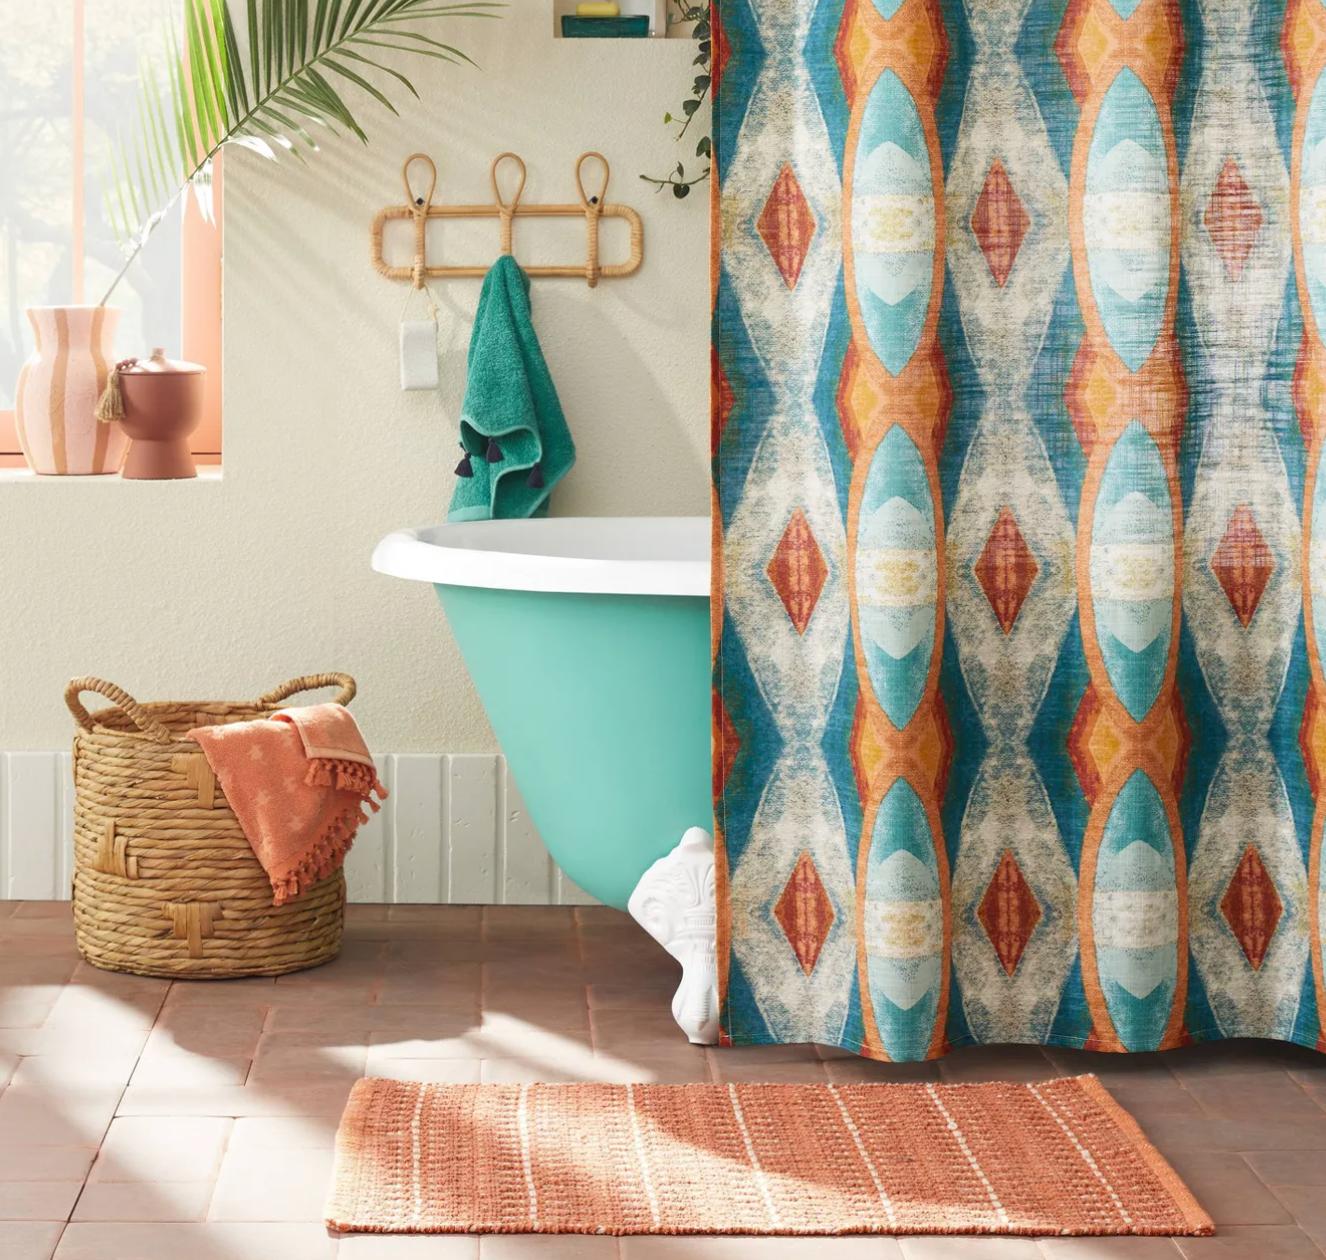 a multi-textured rug in a bathroom